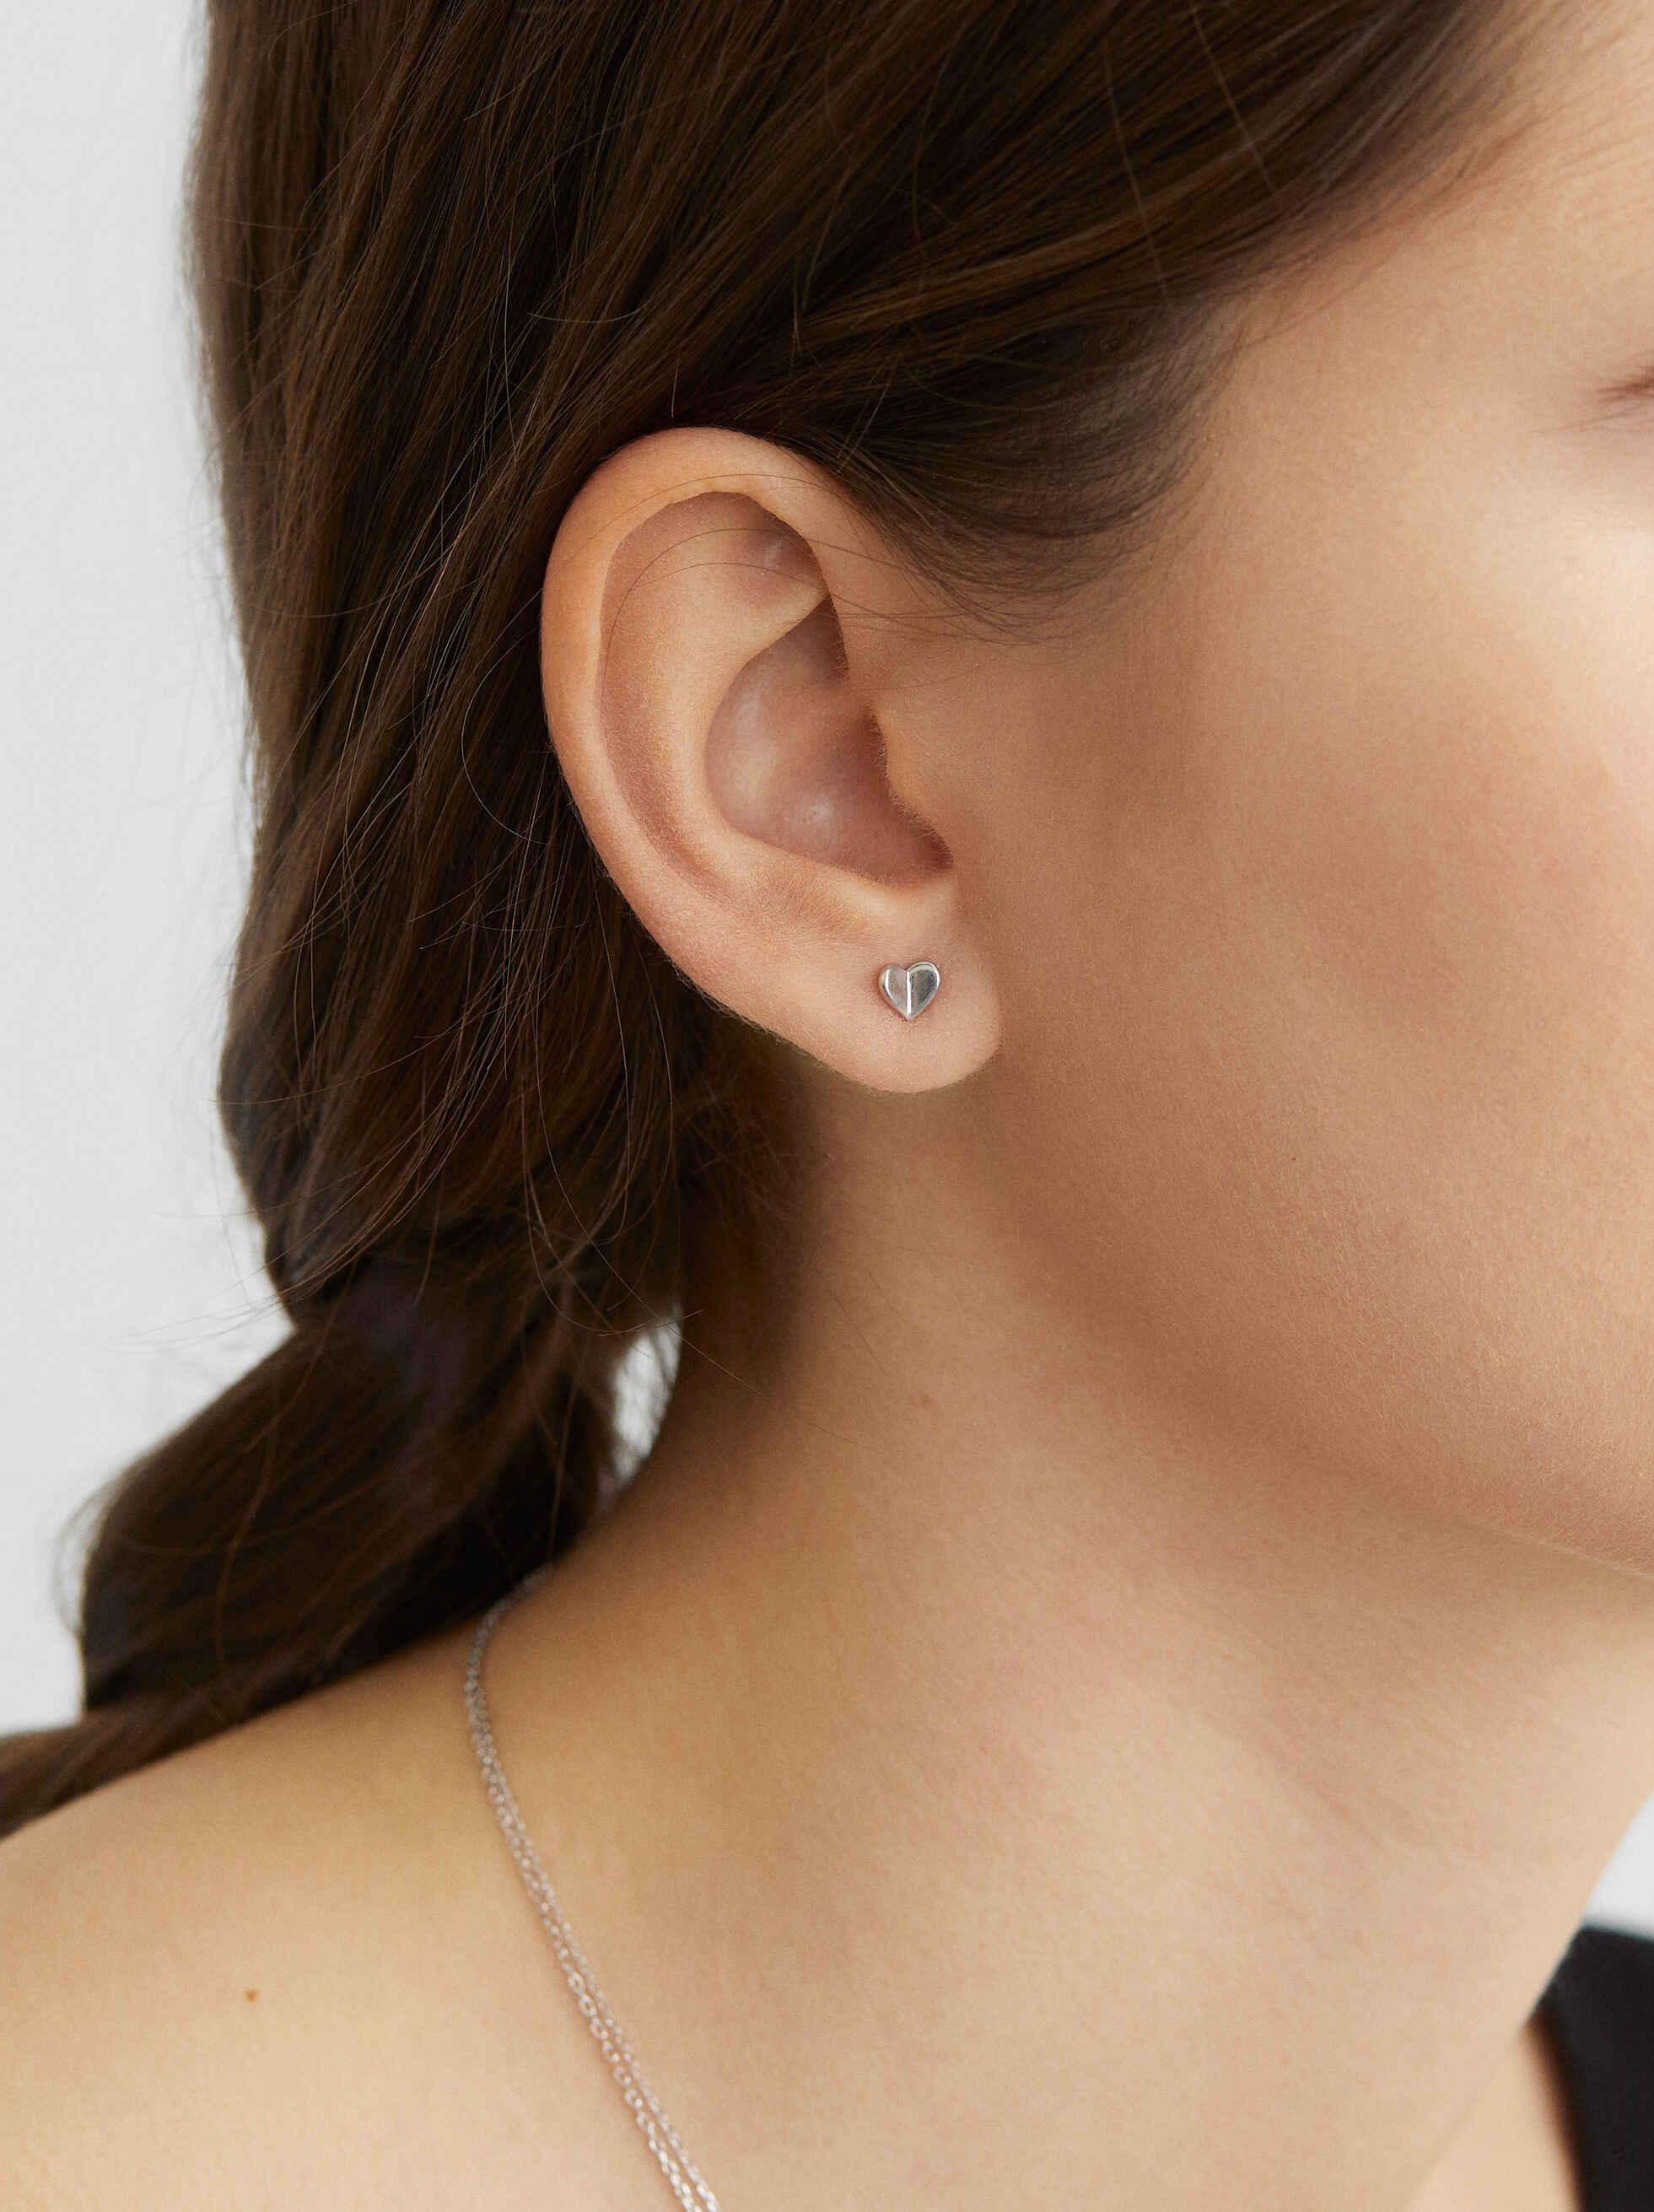 925 Silver Heart Stud Earrings, Silver, hi-res